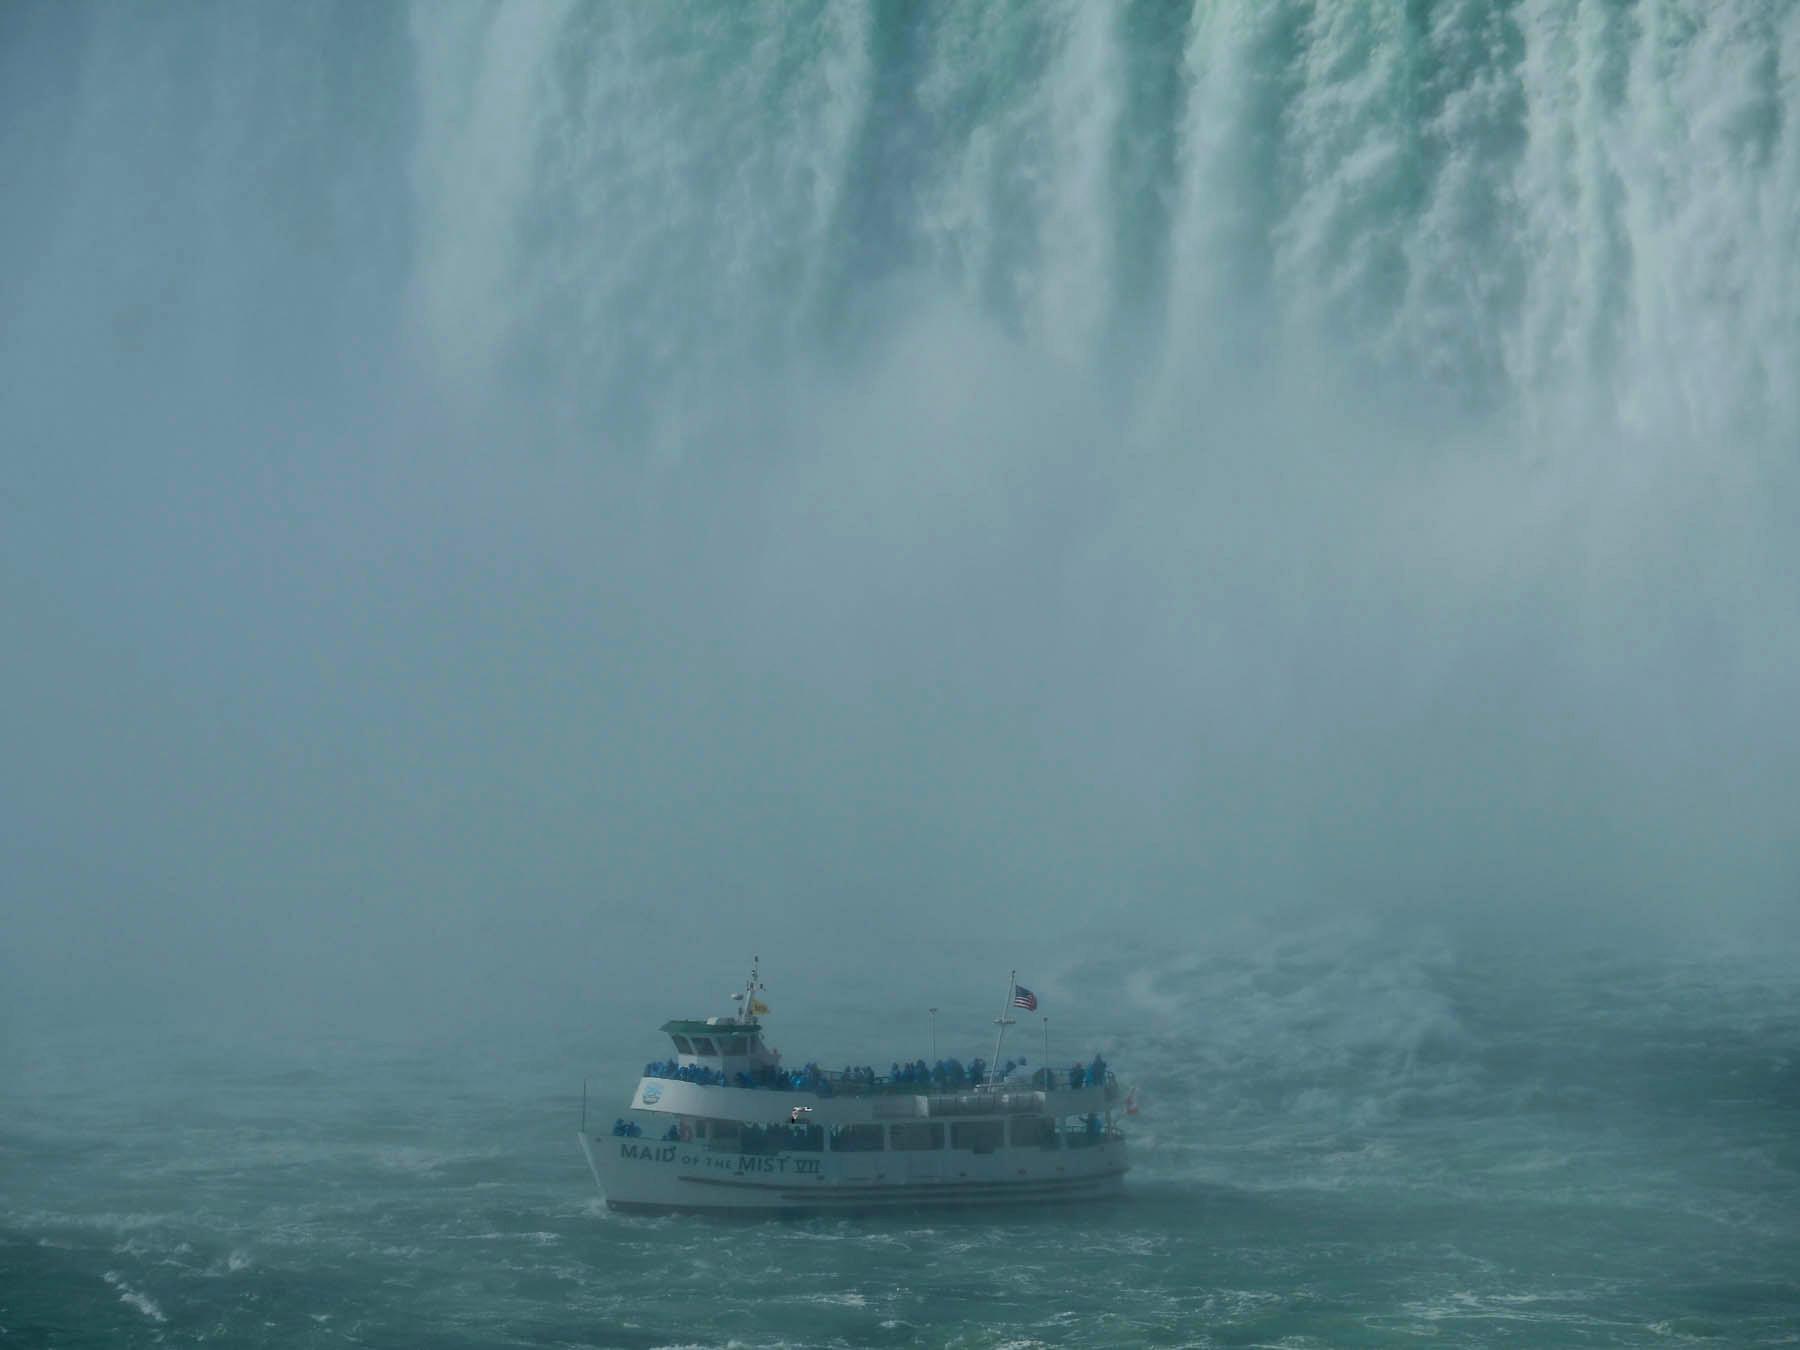 Niagara, Maid of the Mist